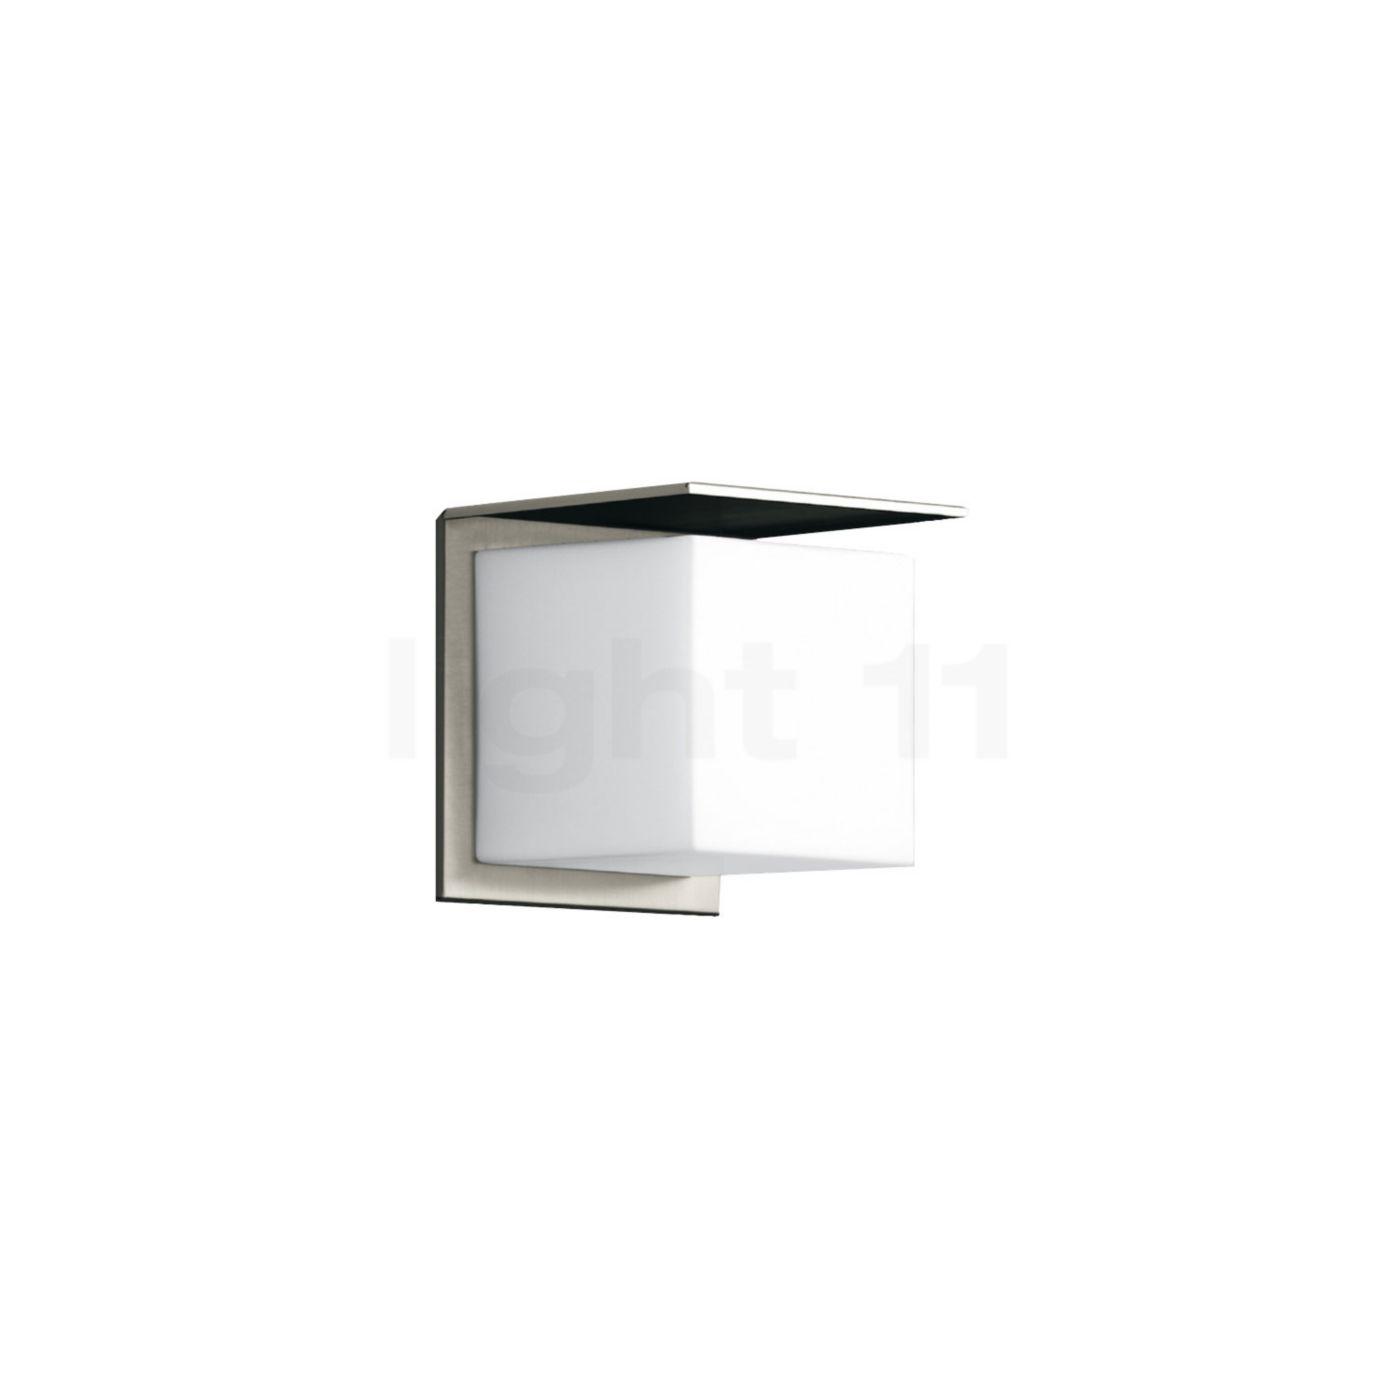 bega 44005 wandleuchte fluo kaufen bei. Black Bedroom Furniture Sets. Home Design Ideas